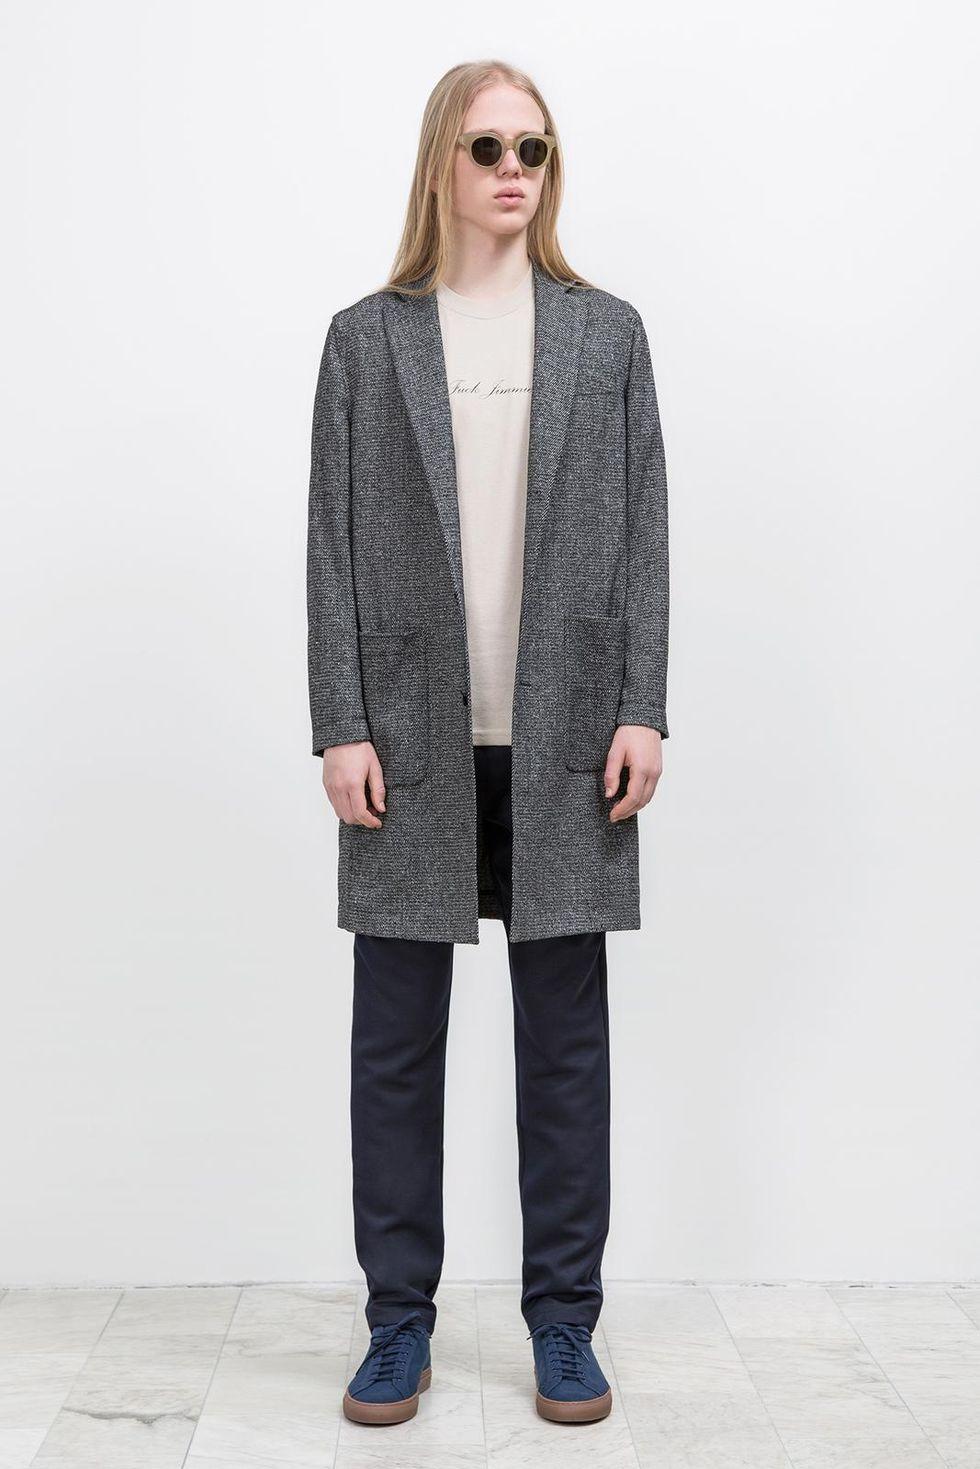 tres-bien-menswear-collection-spring-summer-2015-03.jpg